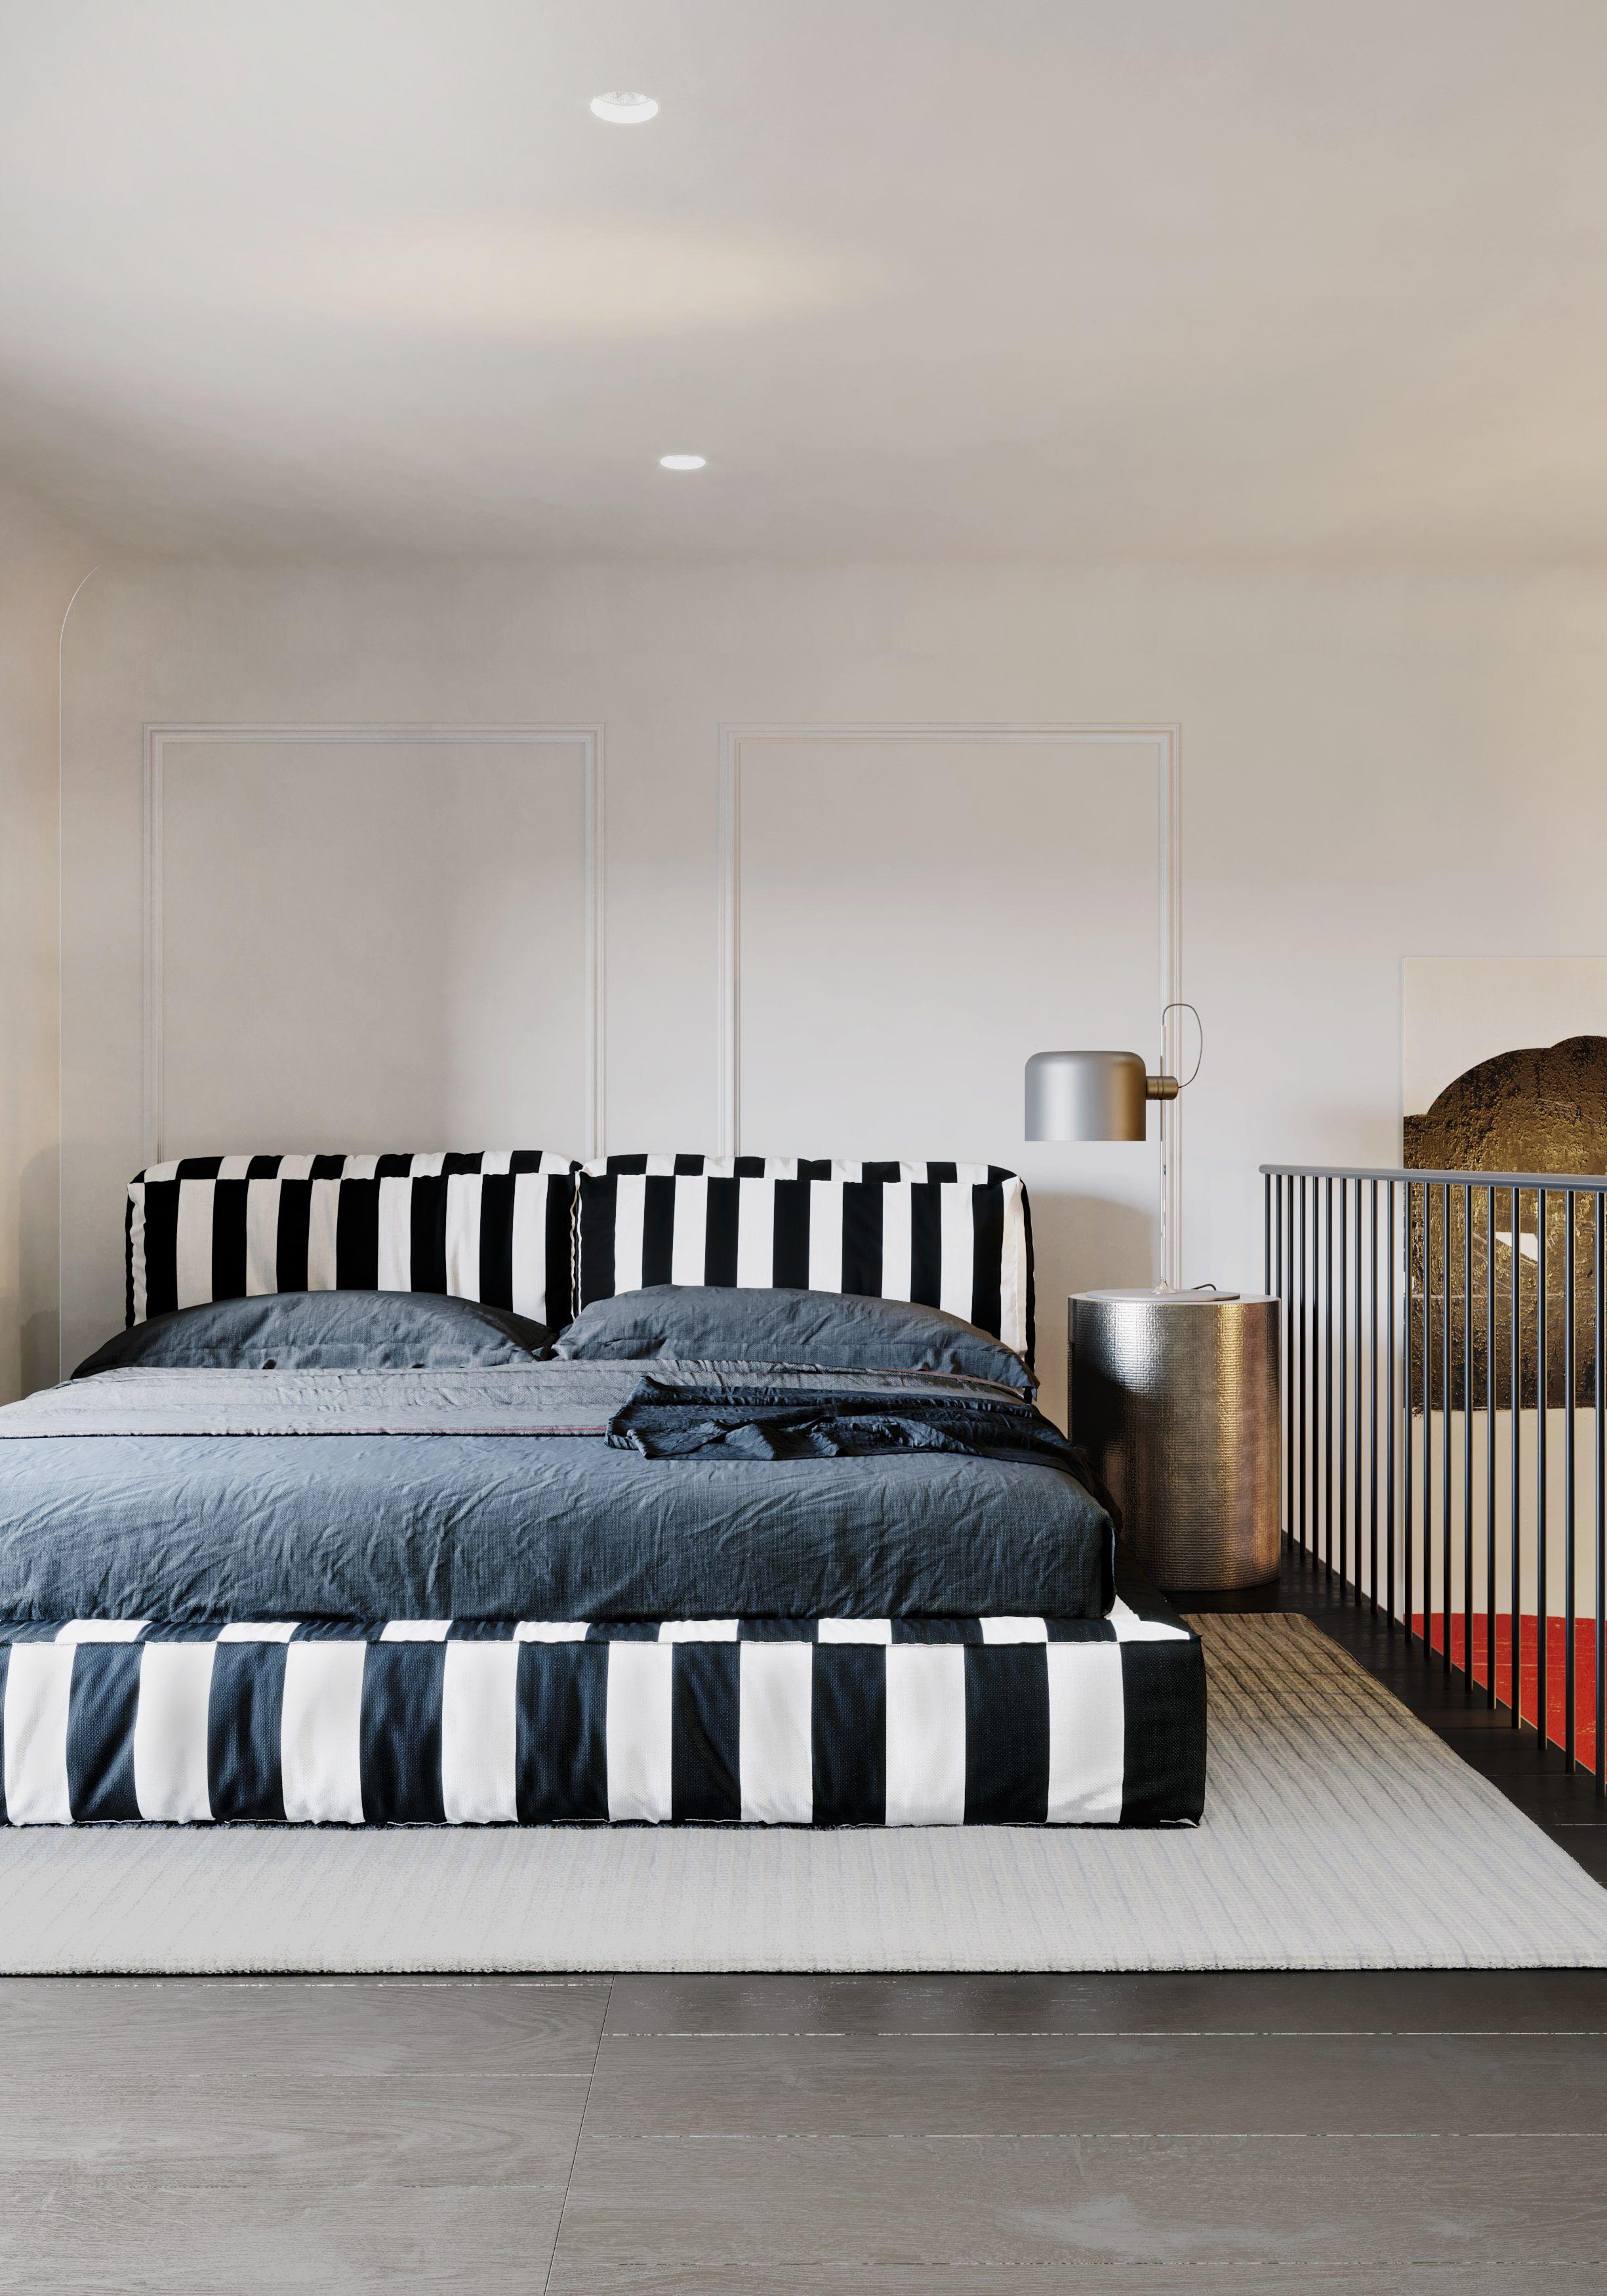 Decorating on flipboard by shermar54 home interior - Bedroom ideas for twenty somethings ...